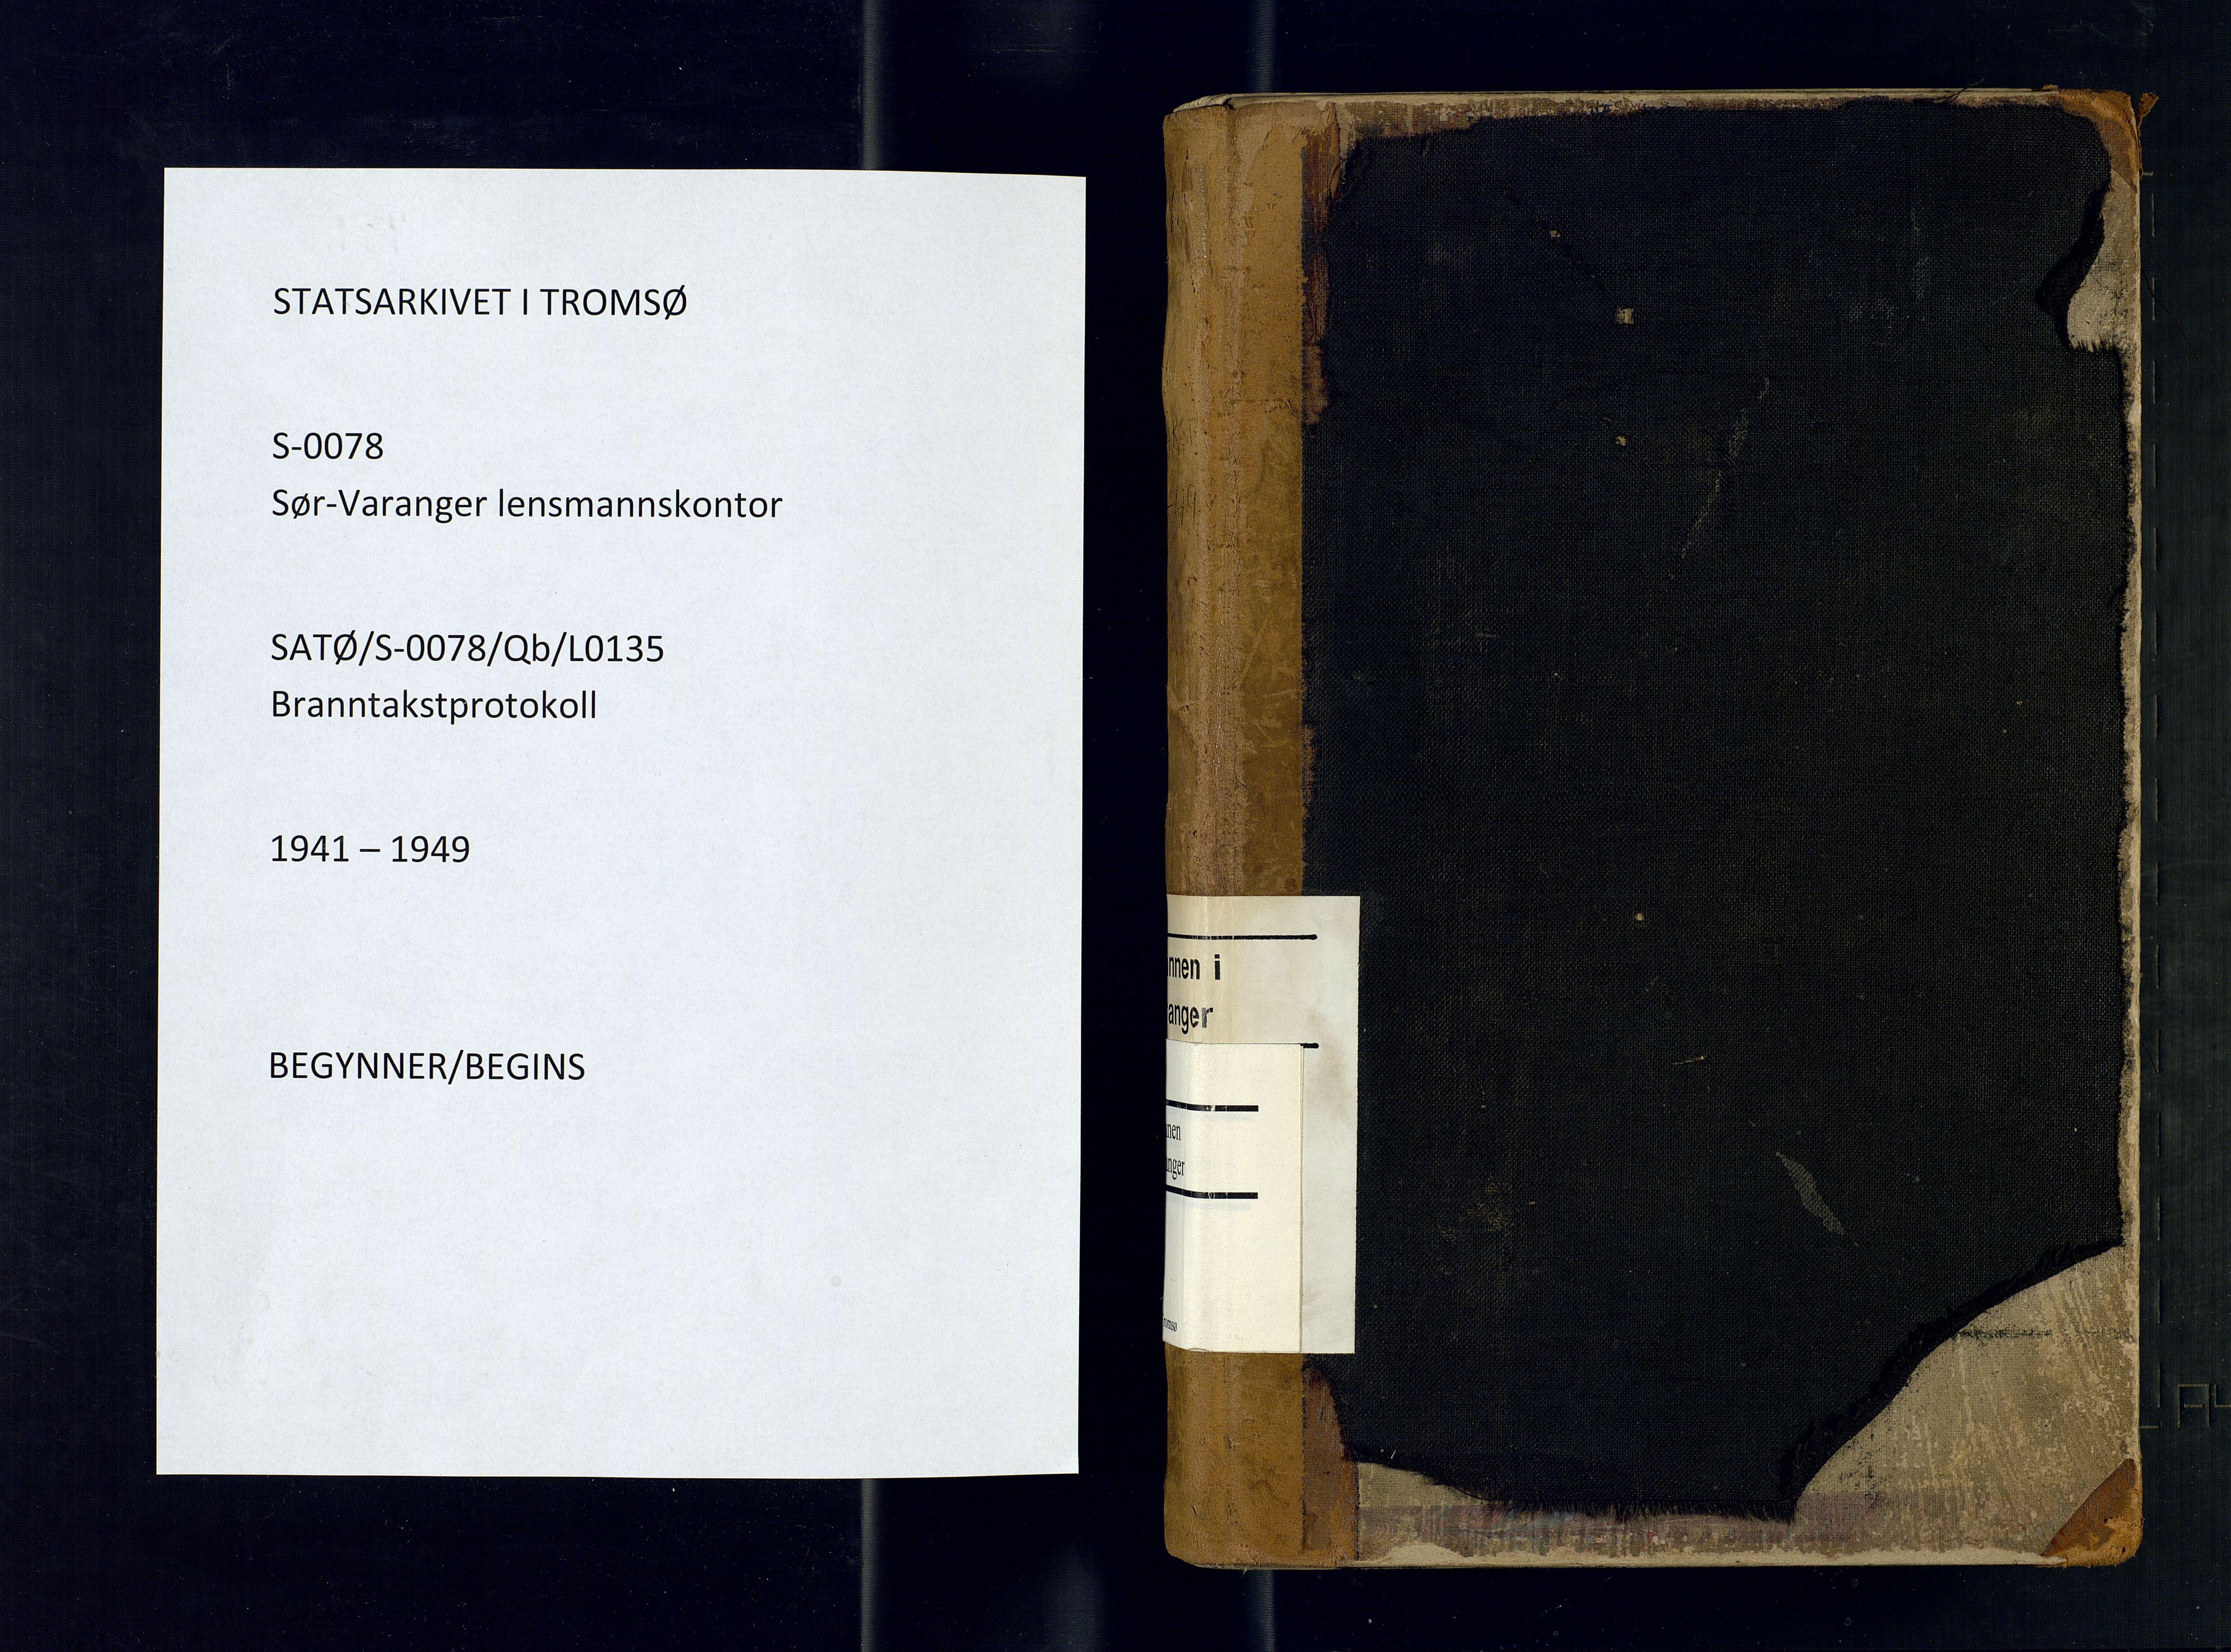 SATØ, Sør-Varanger lensmannskontor, Qb/L0135: Branntakstprotokoller Med reg., 1941-1949